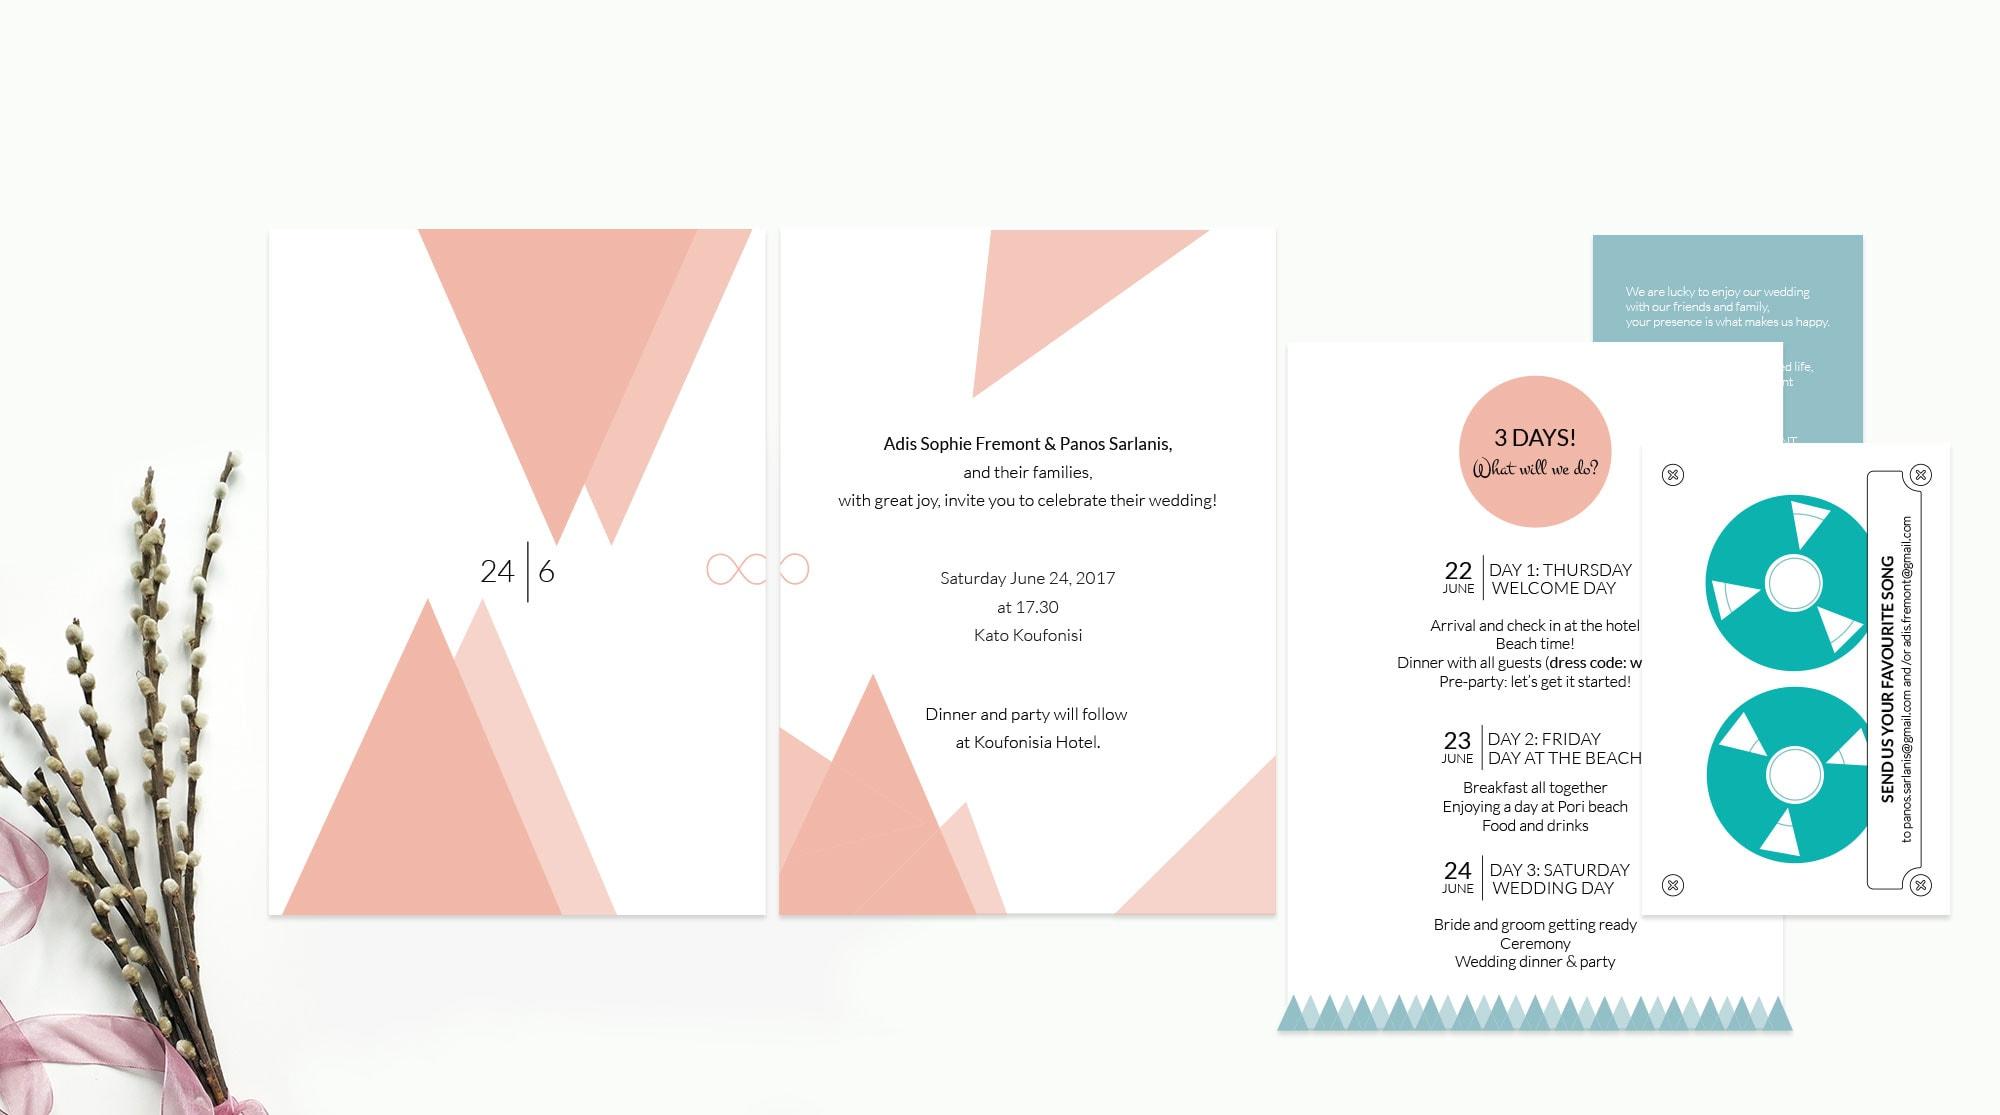 Freelance Graphic Designer in Amsterdam